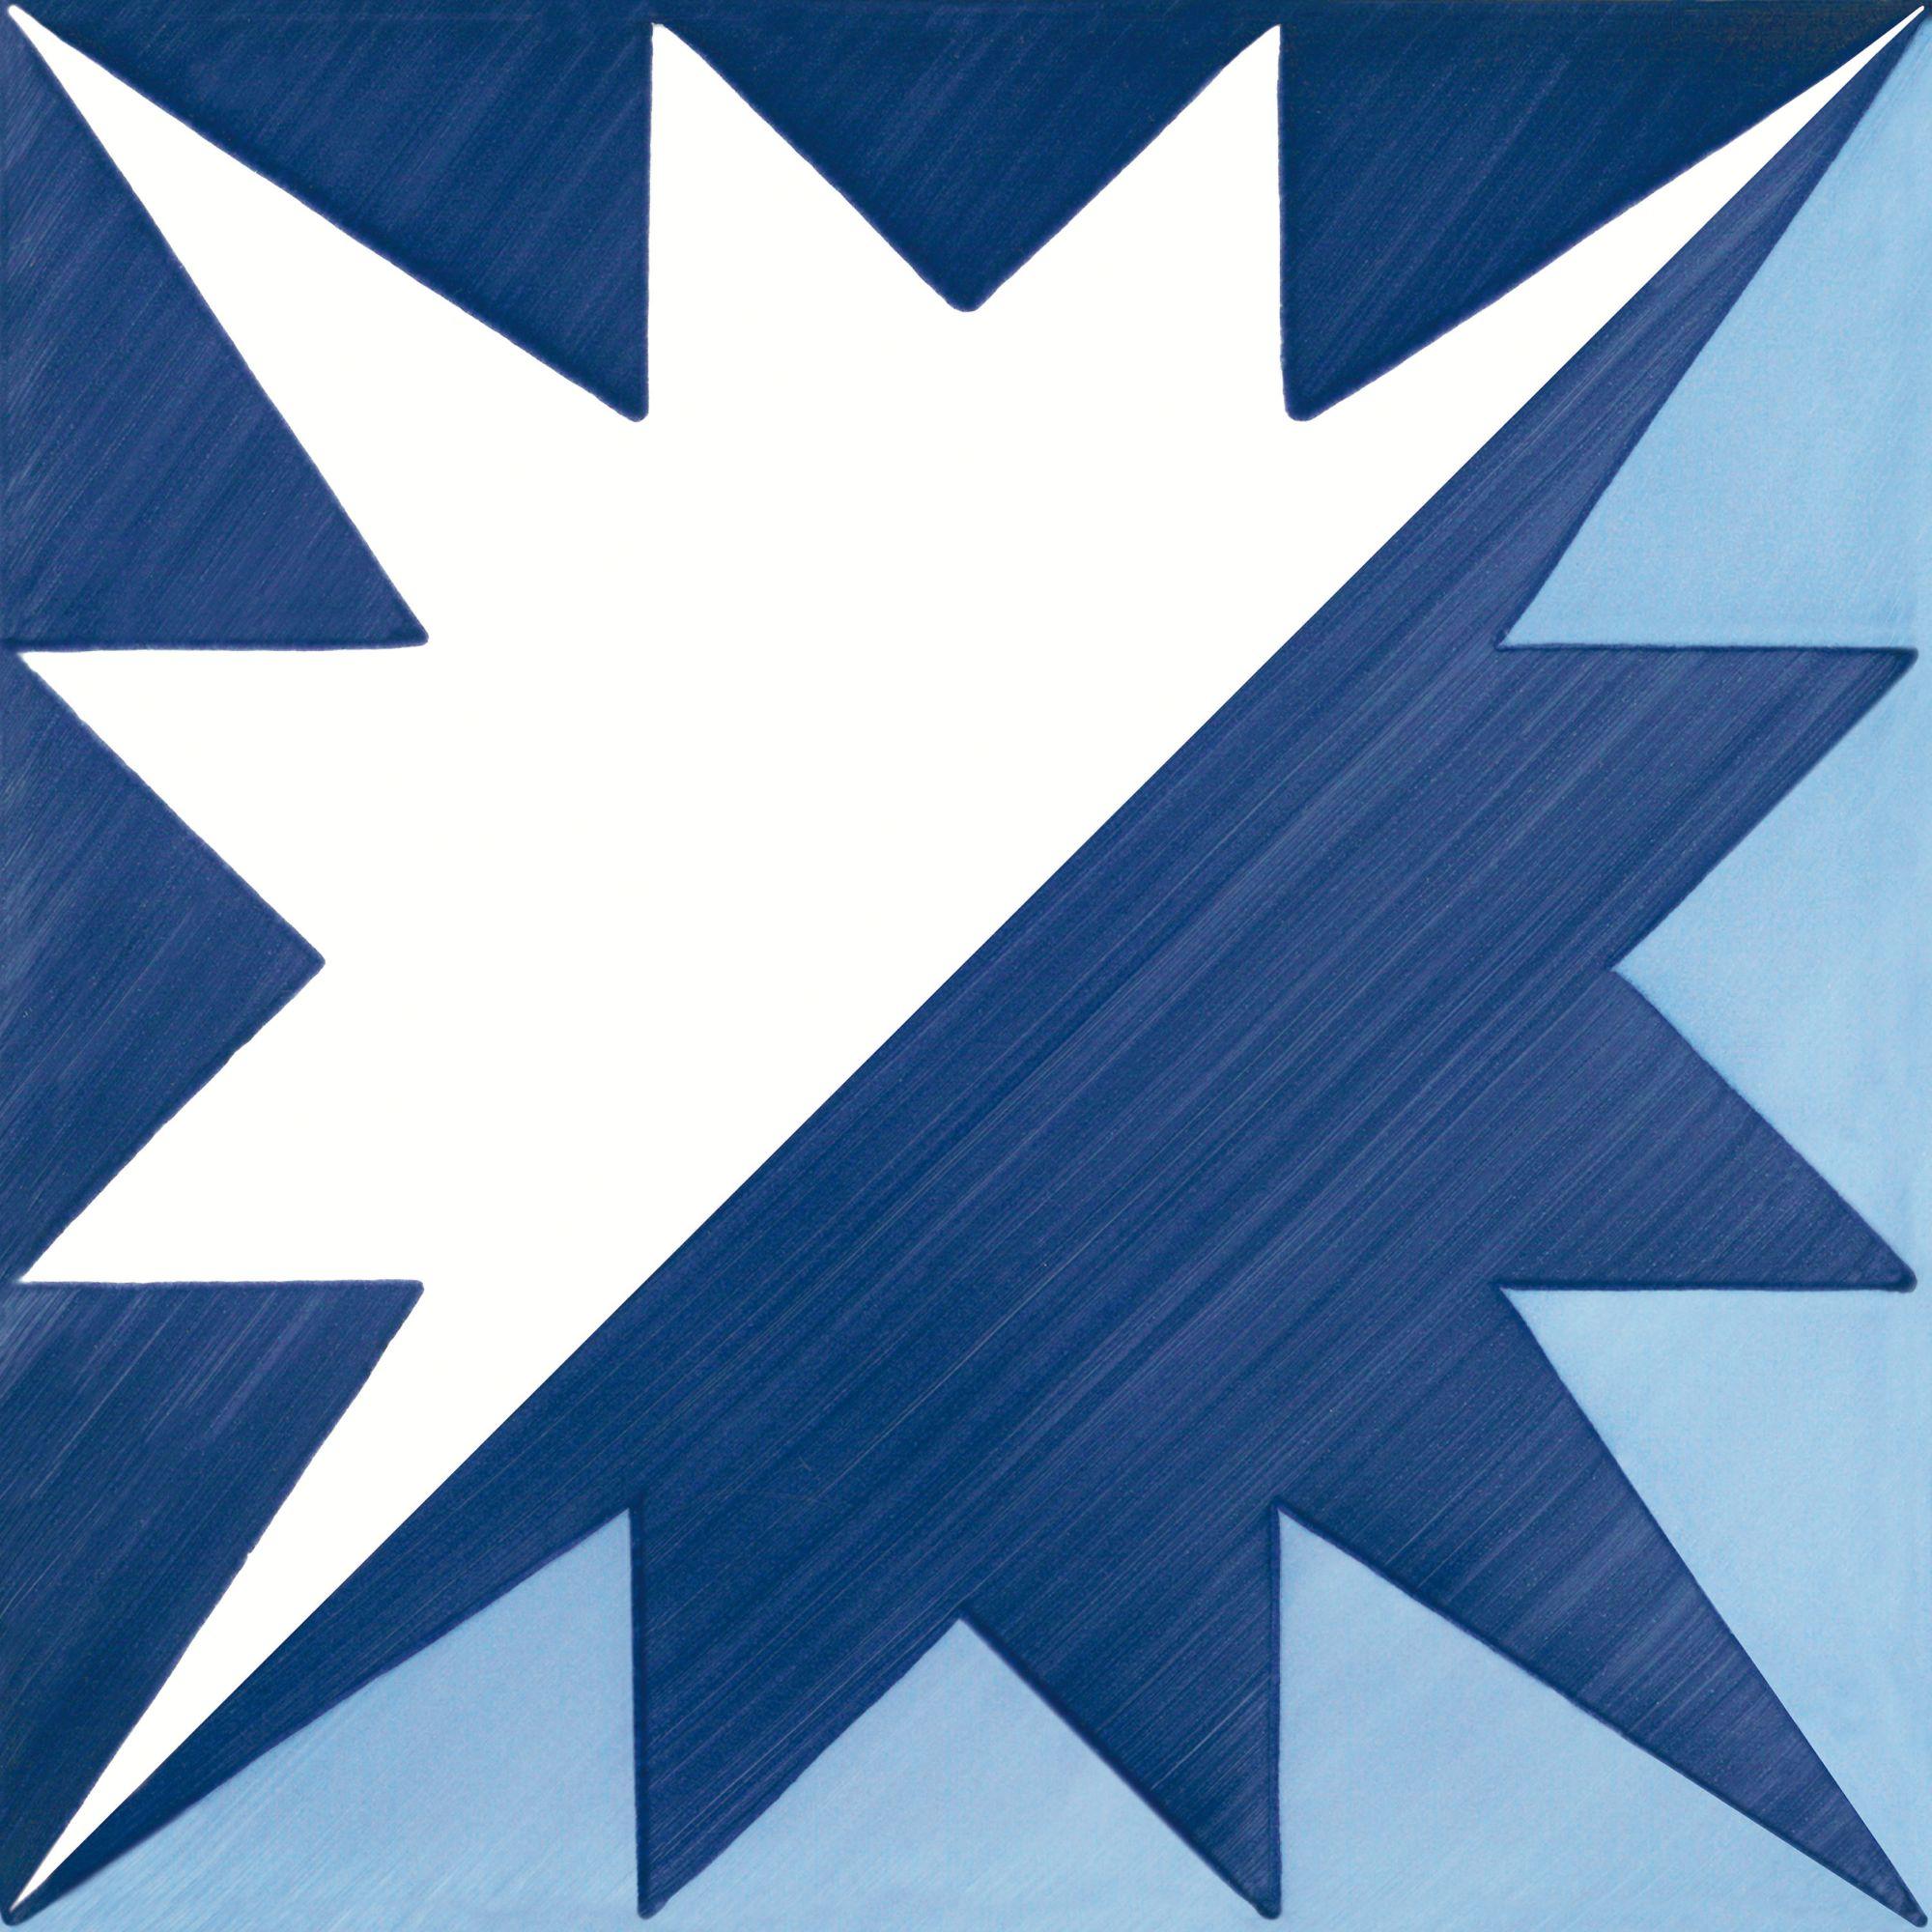 blu-ponti-decoro-tipo-25